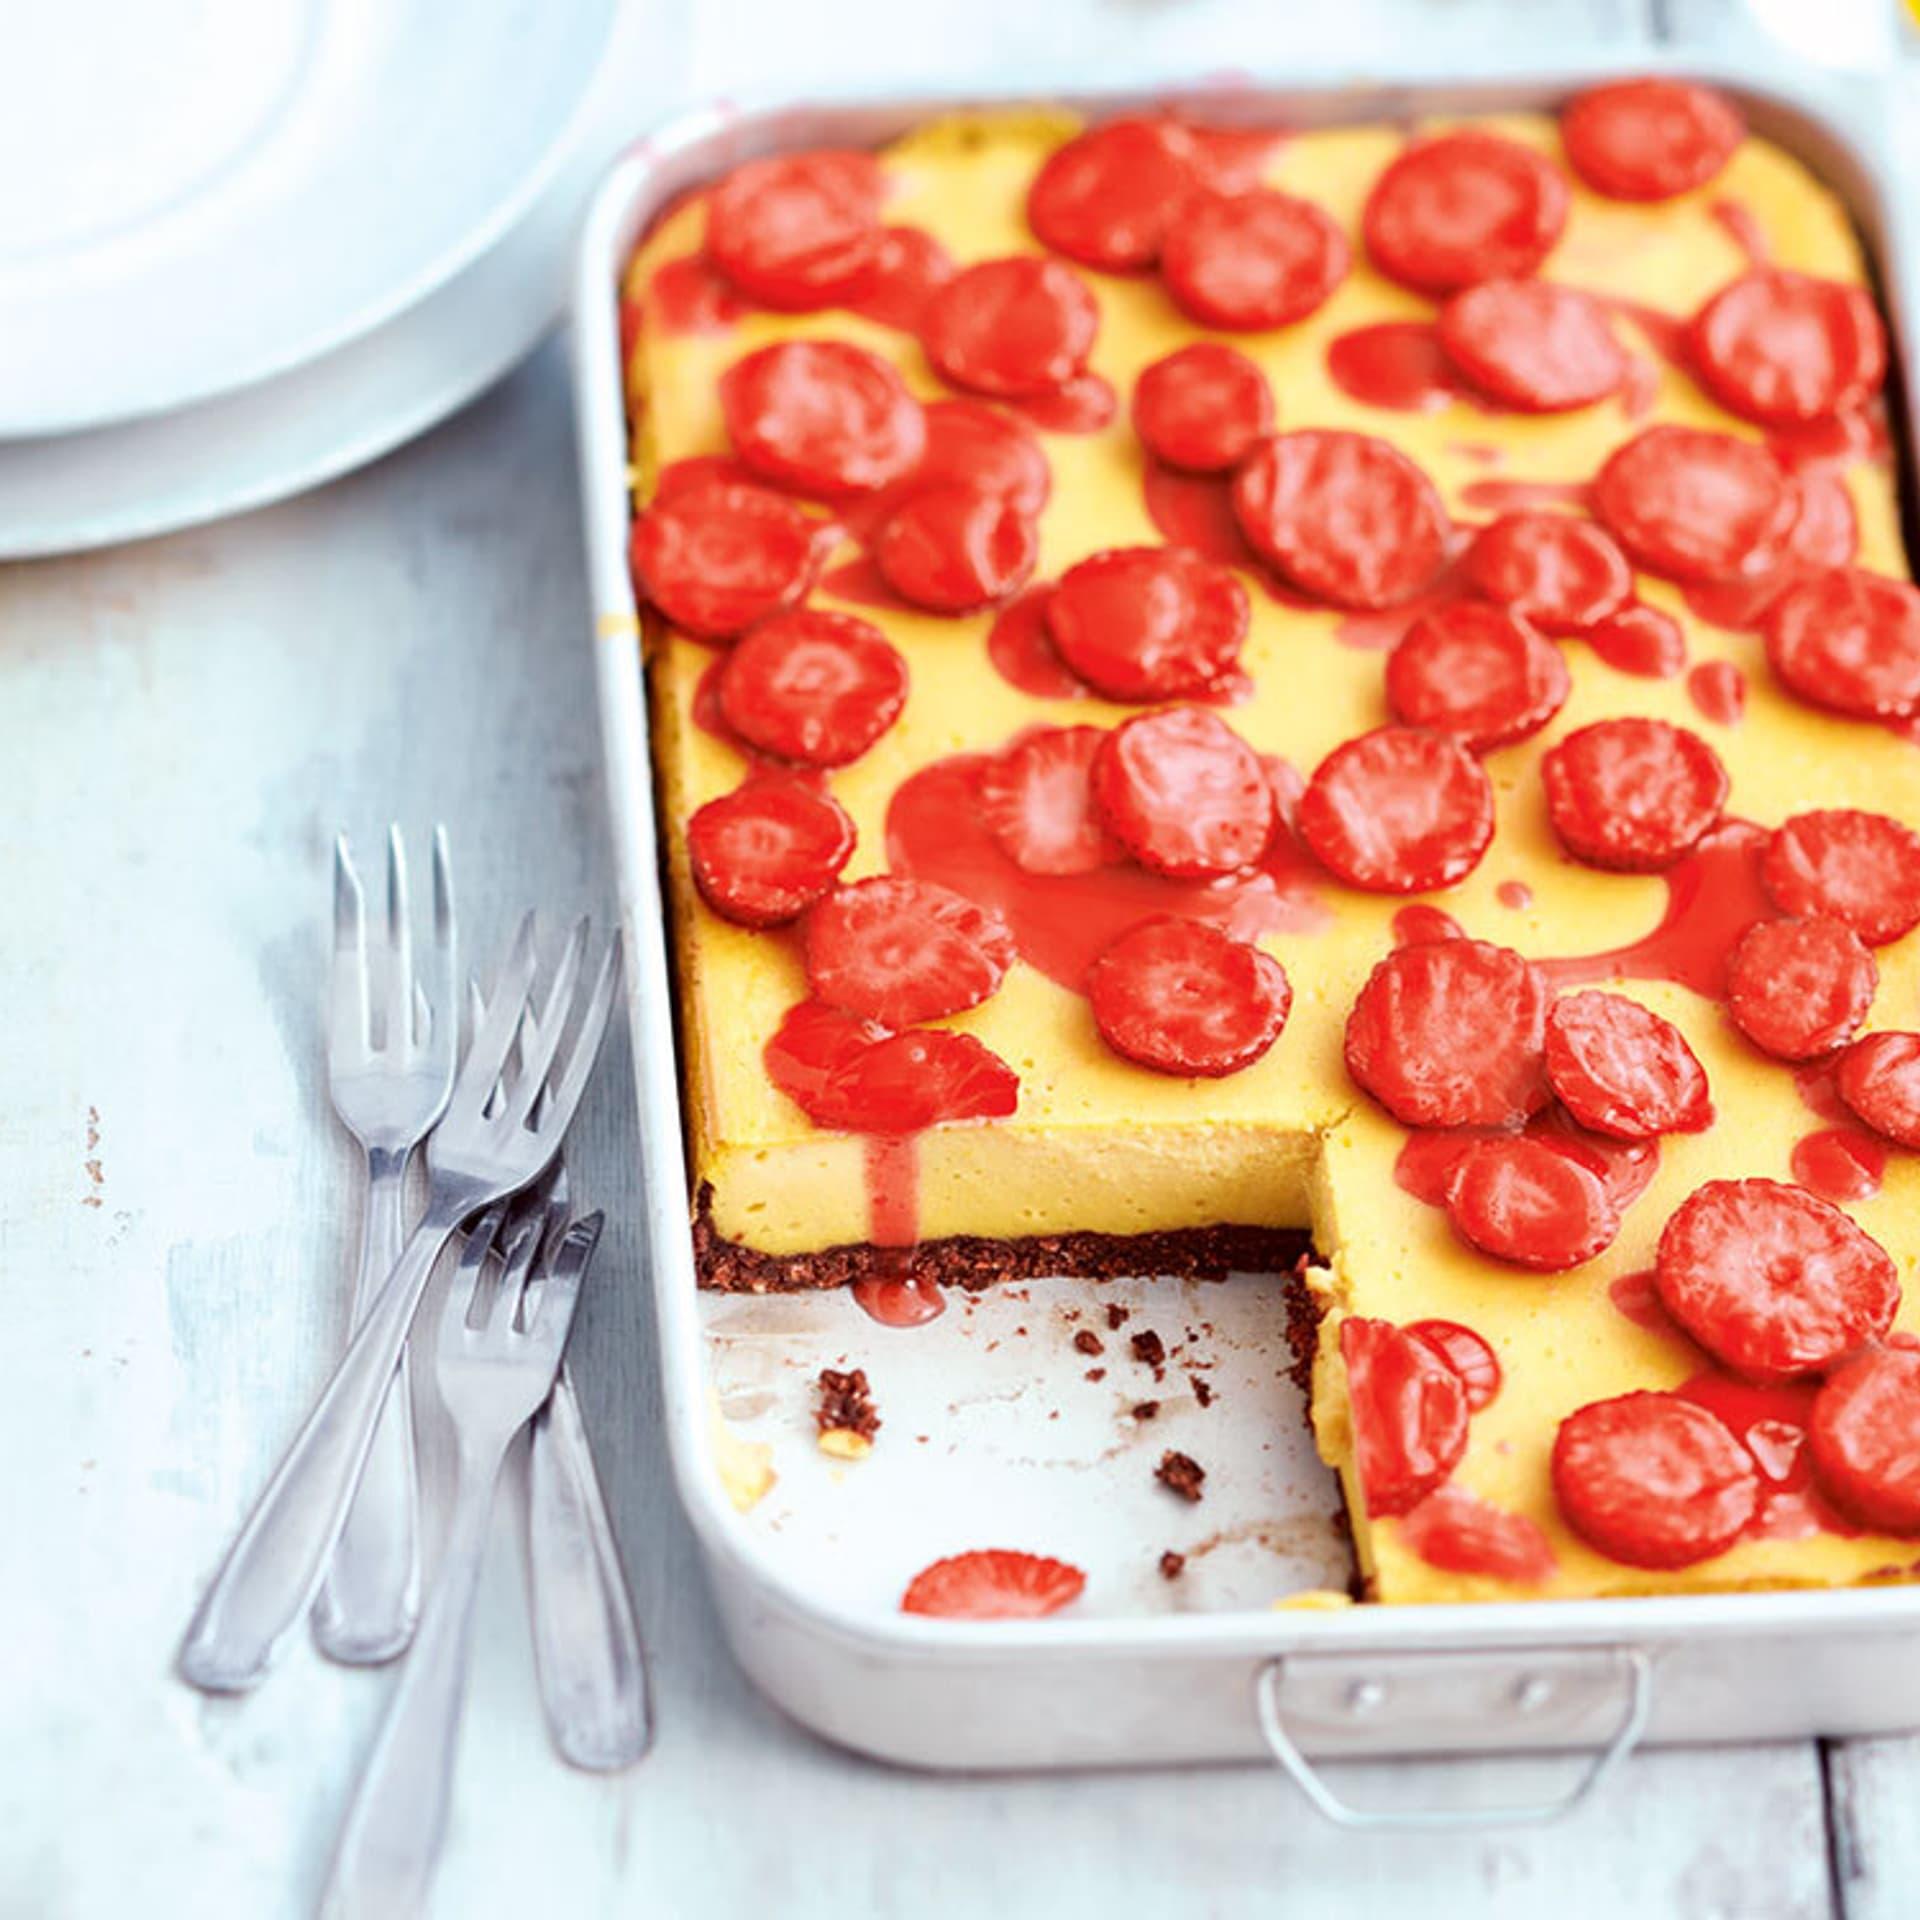 Zitronen tofu kaesekuchen mit erdbeeren